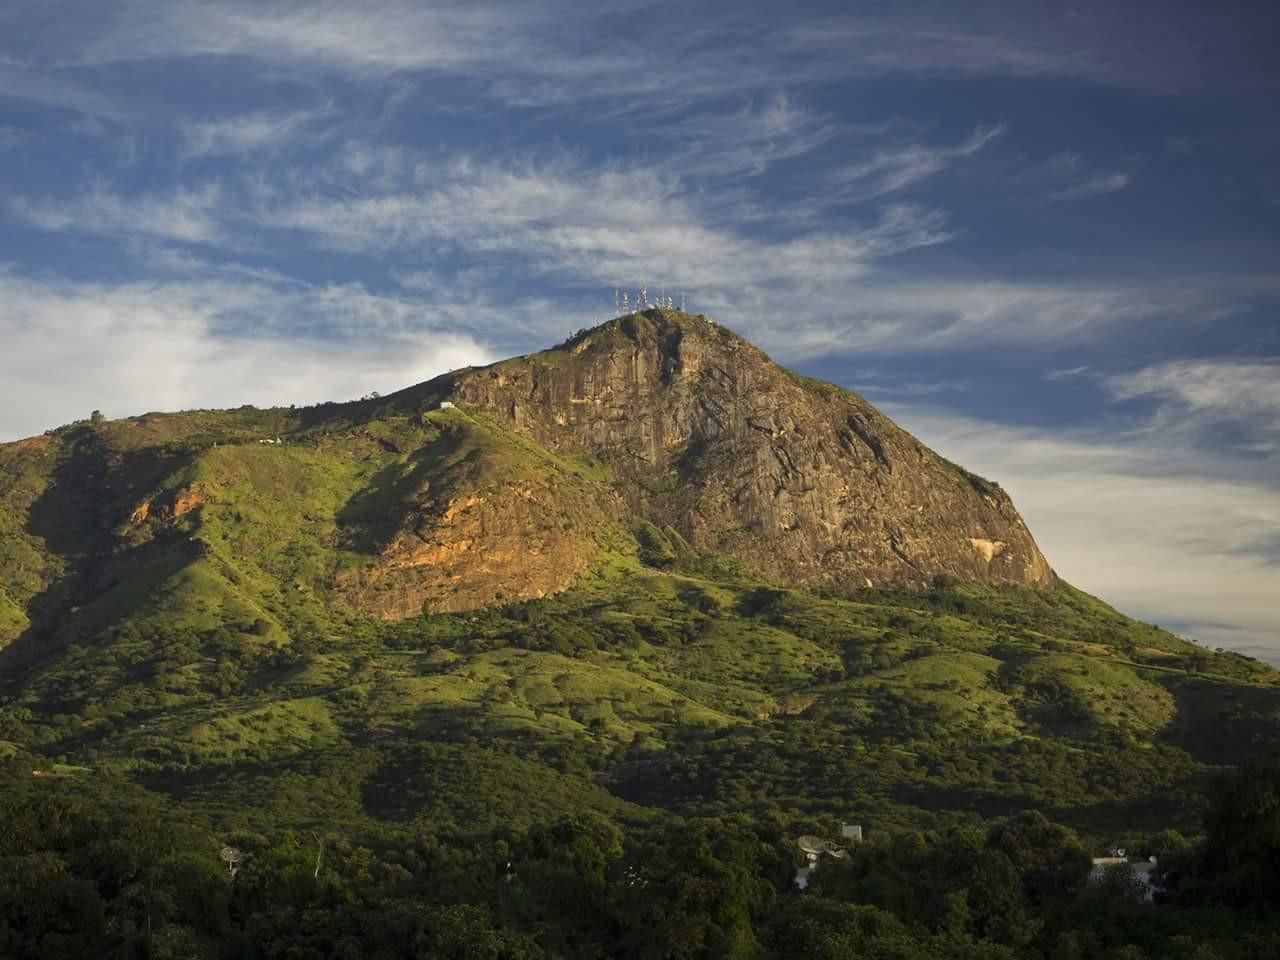 Pico do Ibituruna - Governador Valadares - Brazil